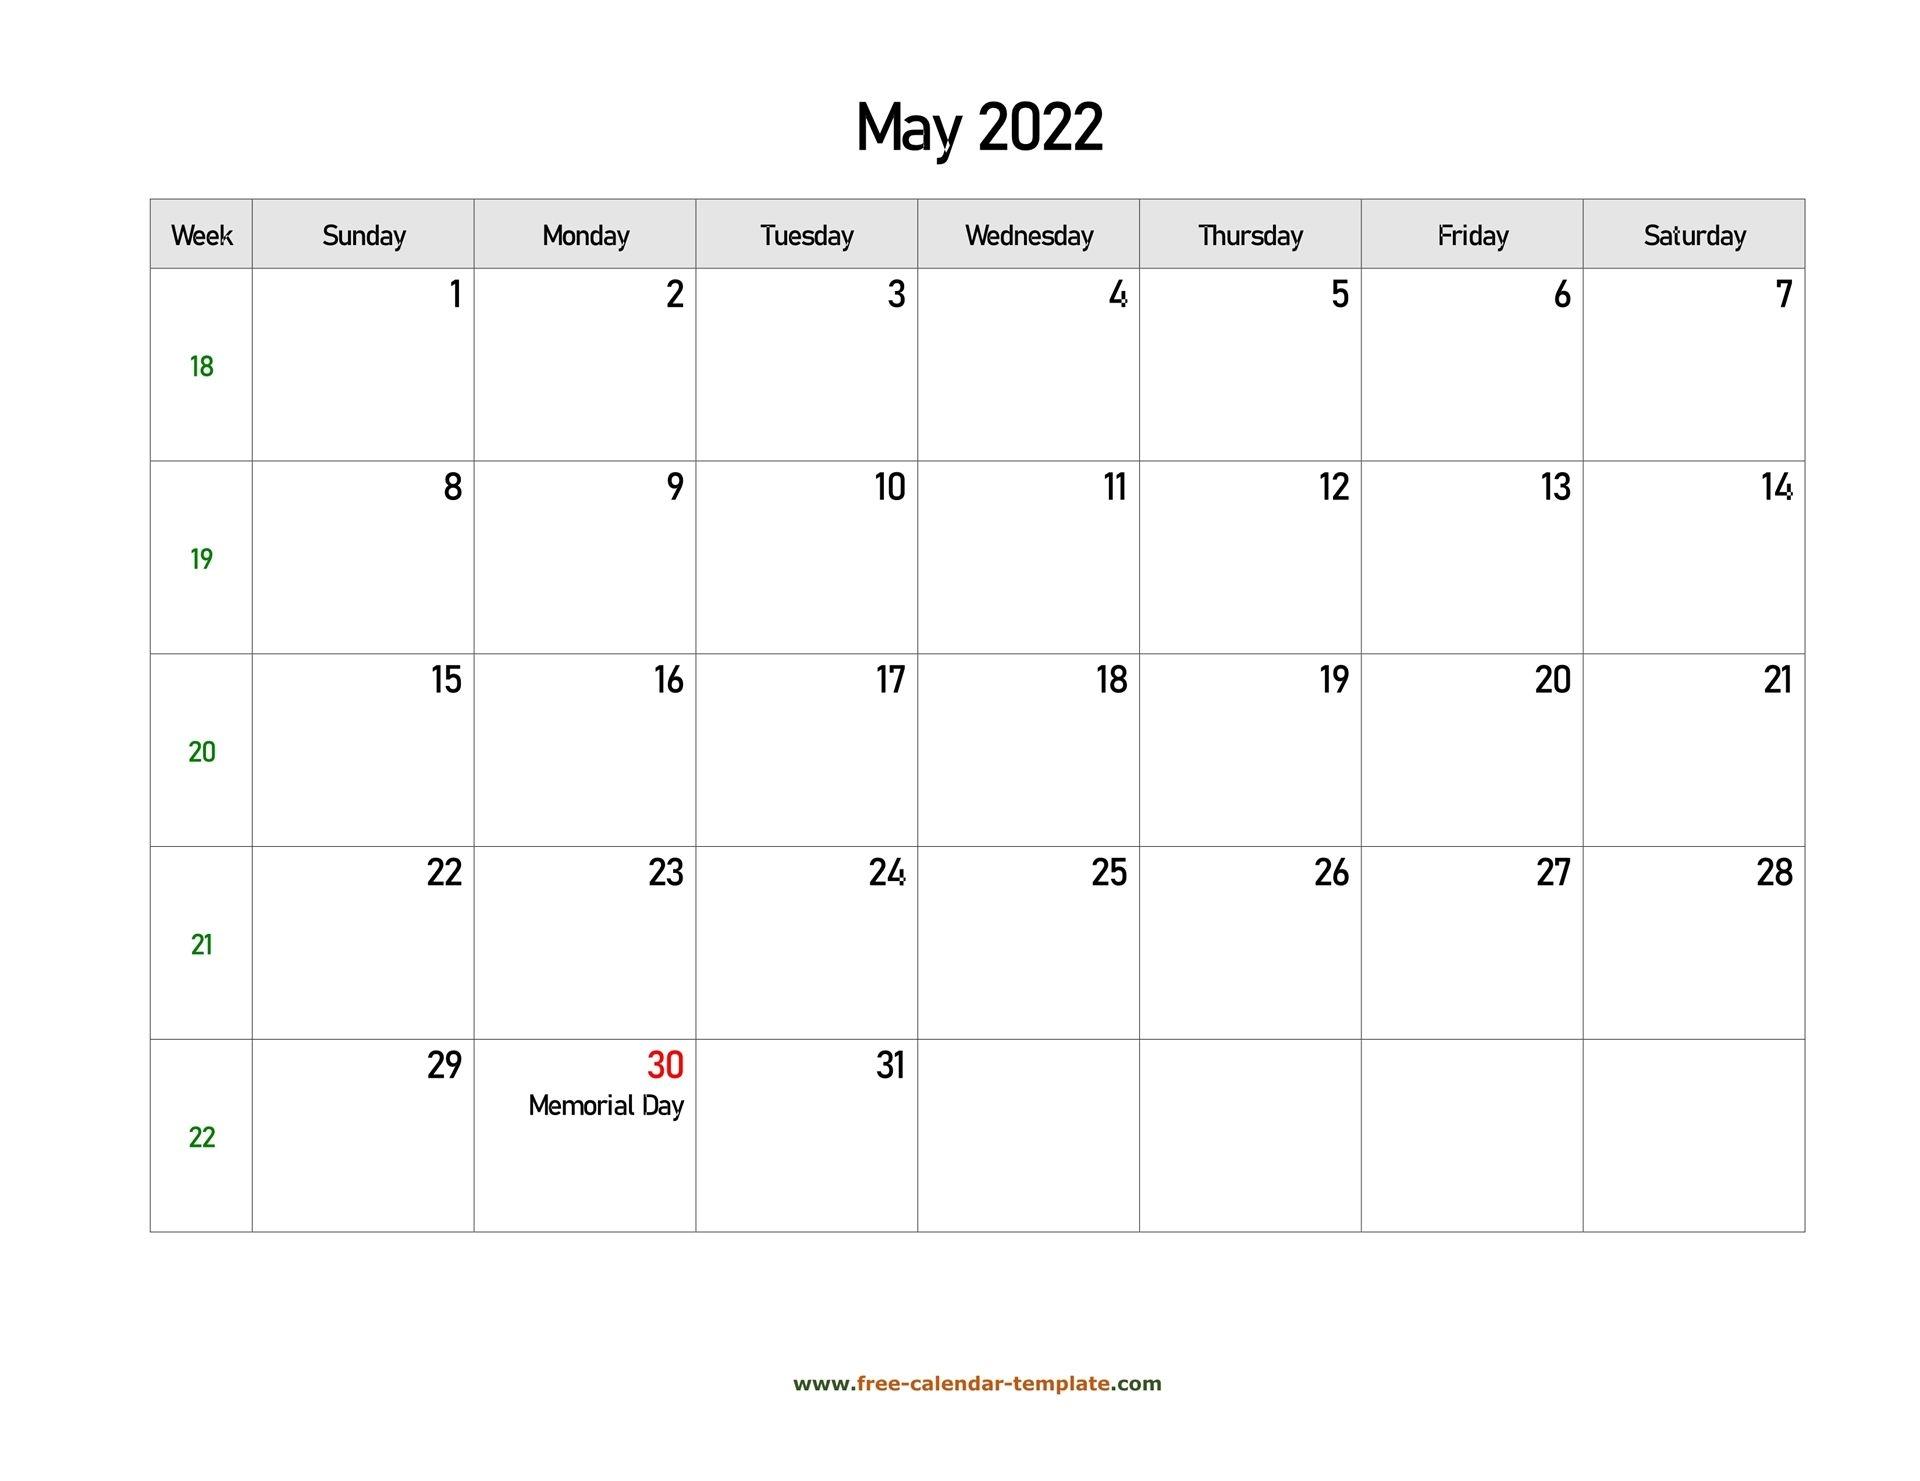 Free 2022 Calendar Blank May Template (Horizontal)   Free